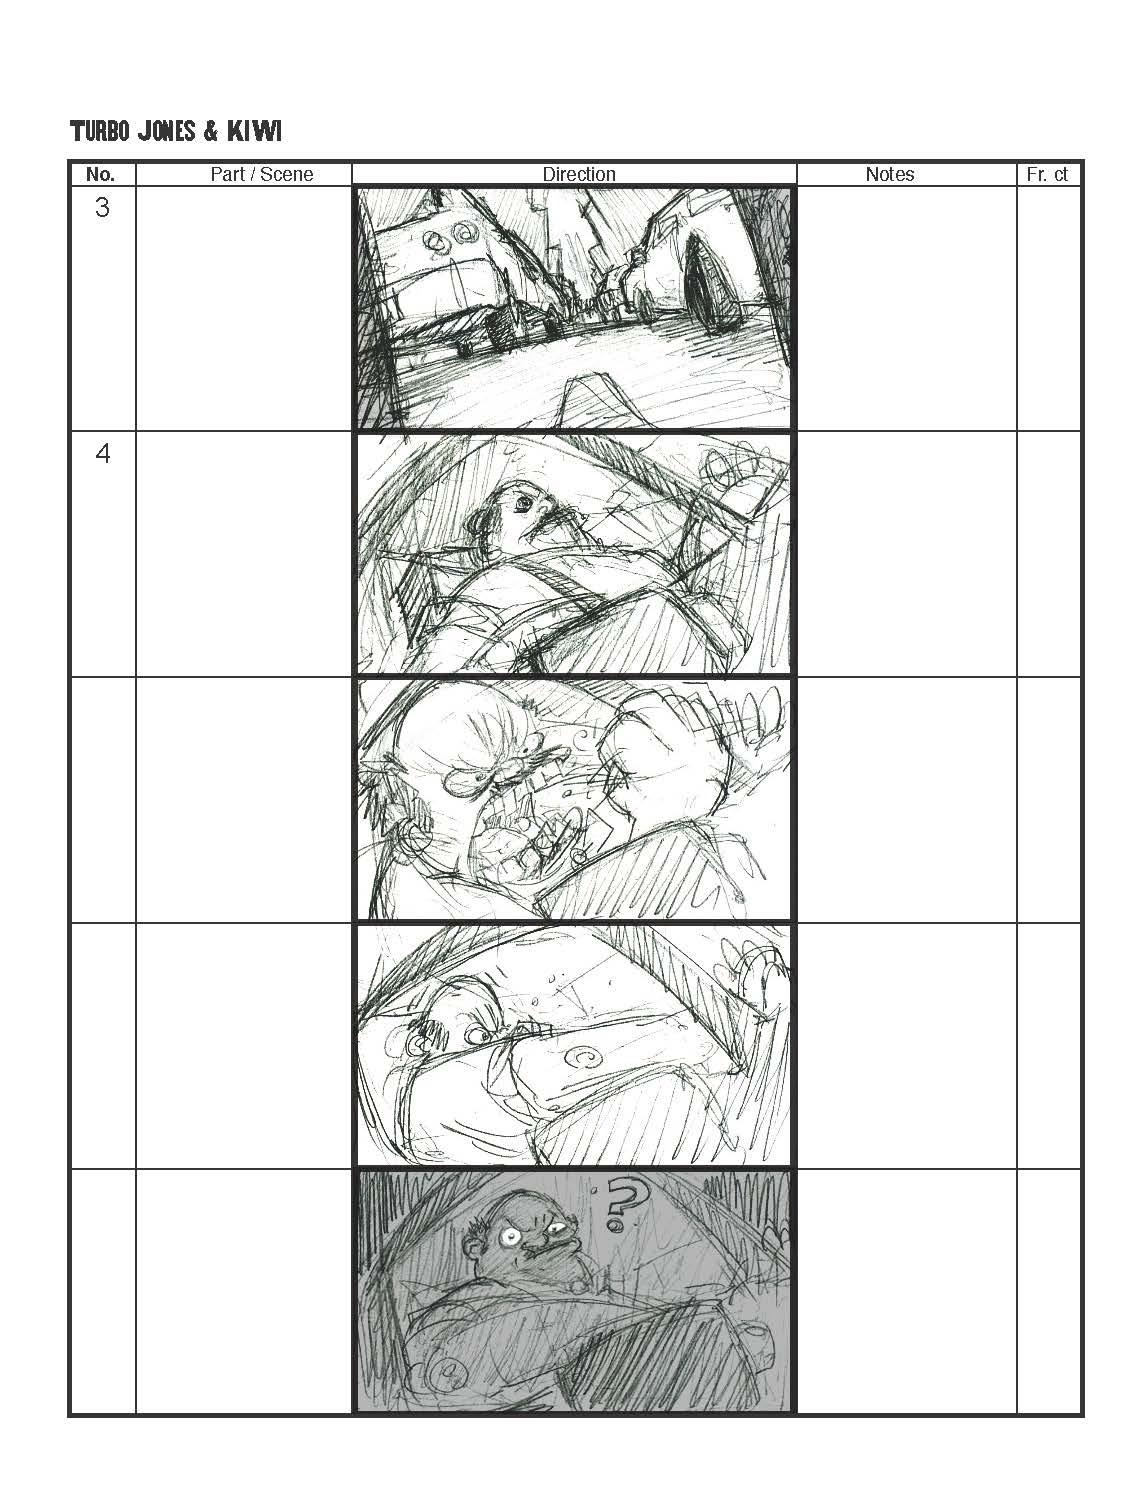 TJK_Storyboards_v01_HIGH_Page_02.jpg